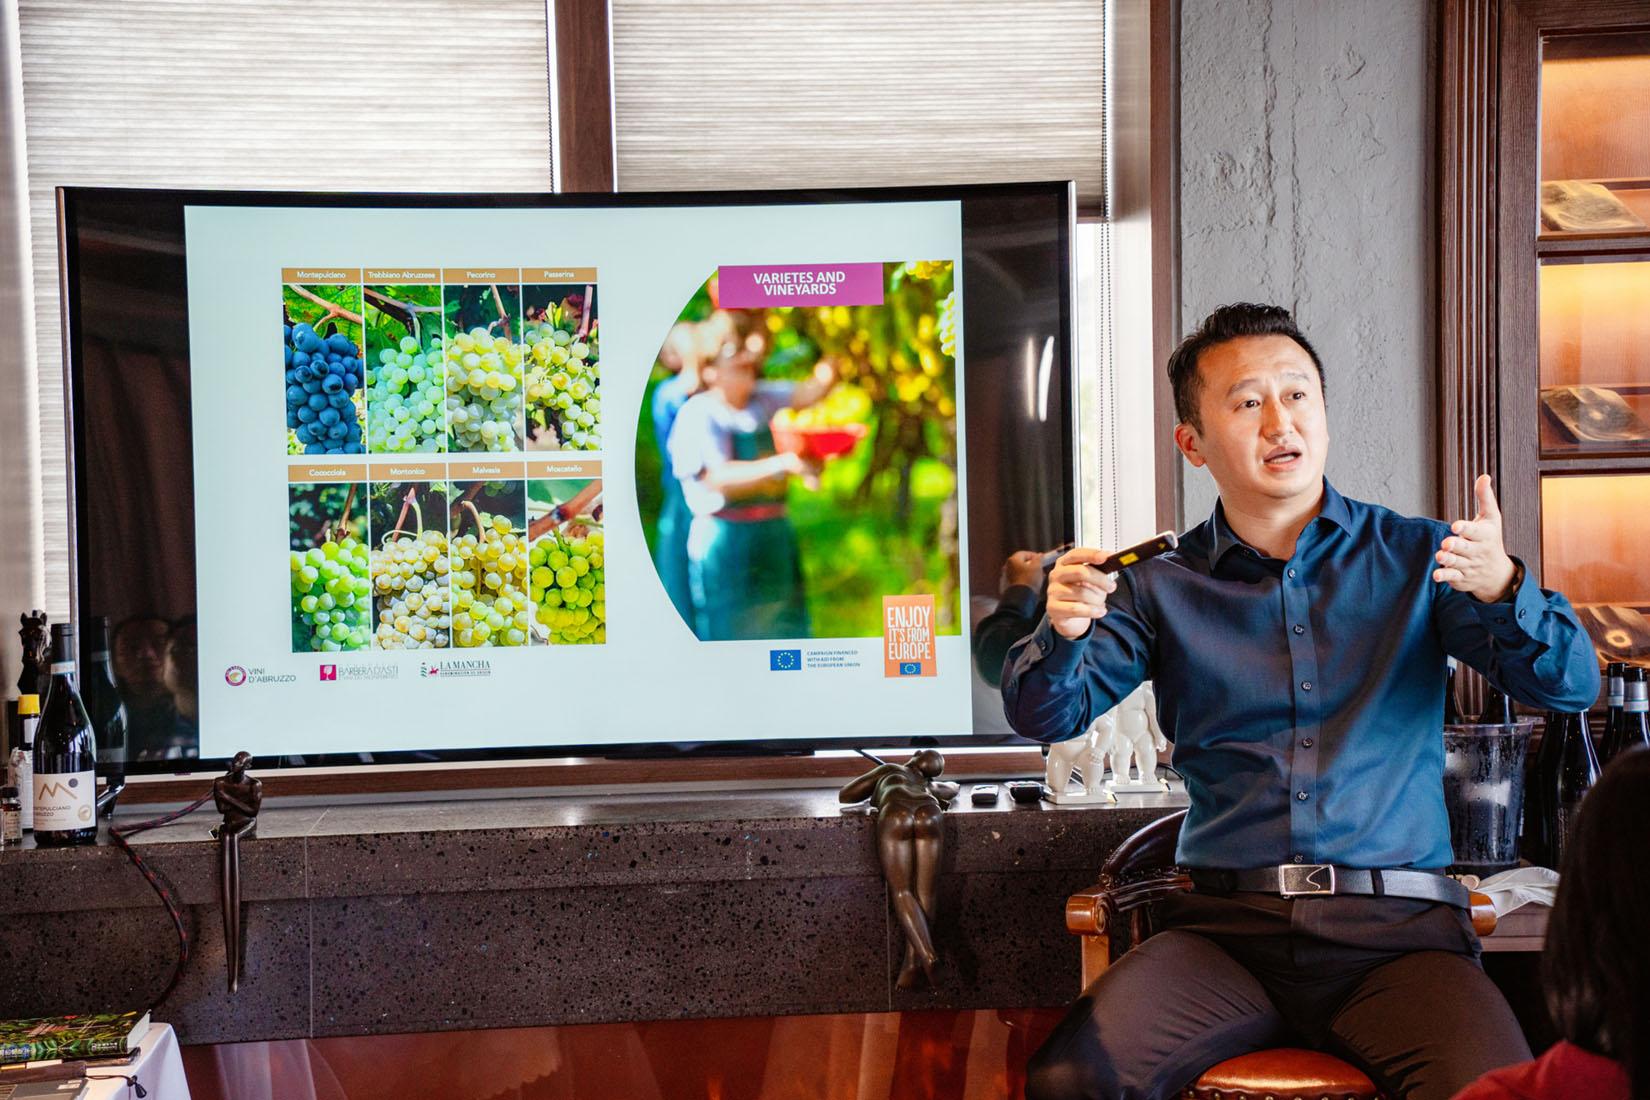 European Sustainable Wines Tasting Event in Xiamen